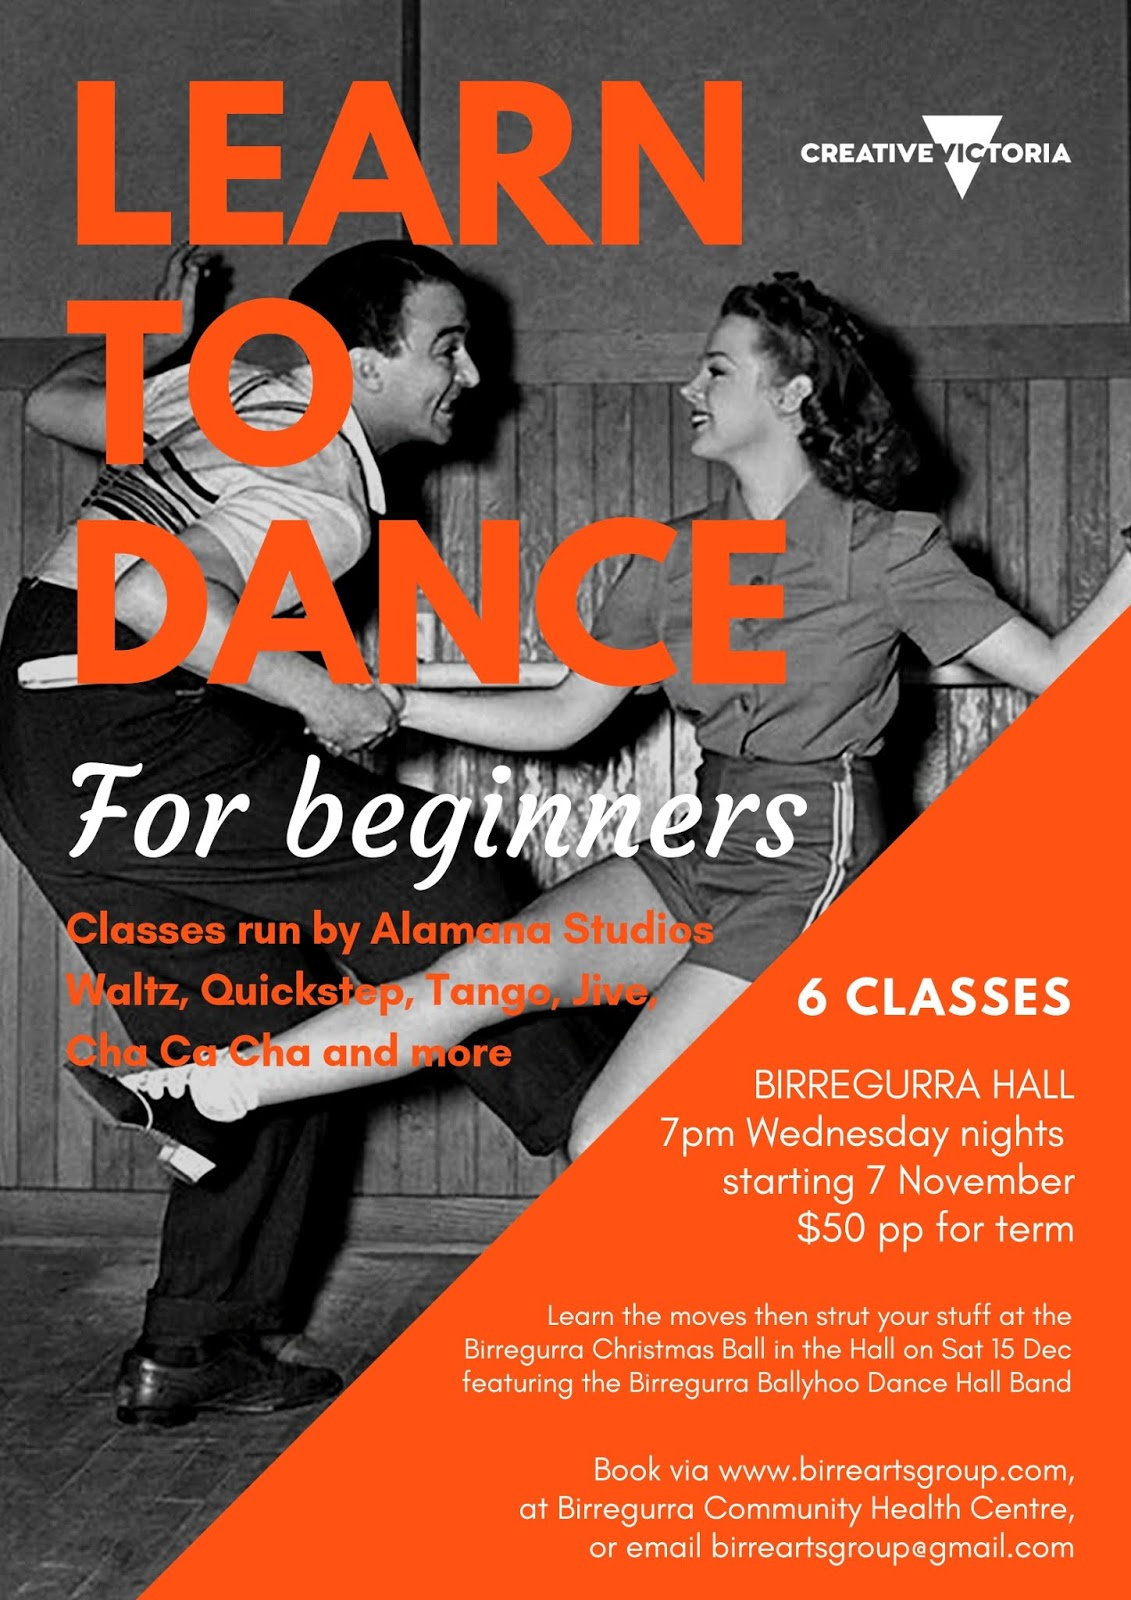 dance classes are coming to birregurra in november